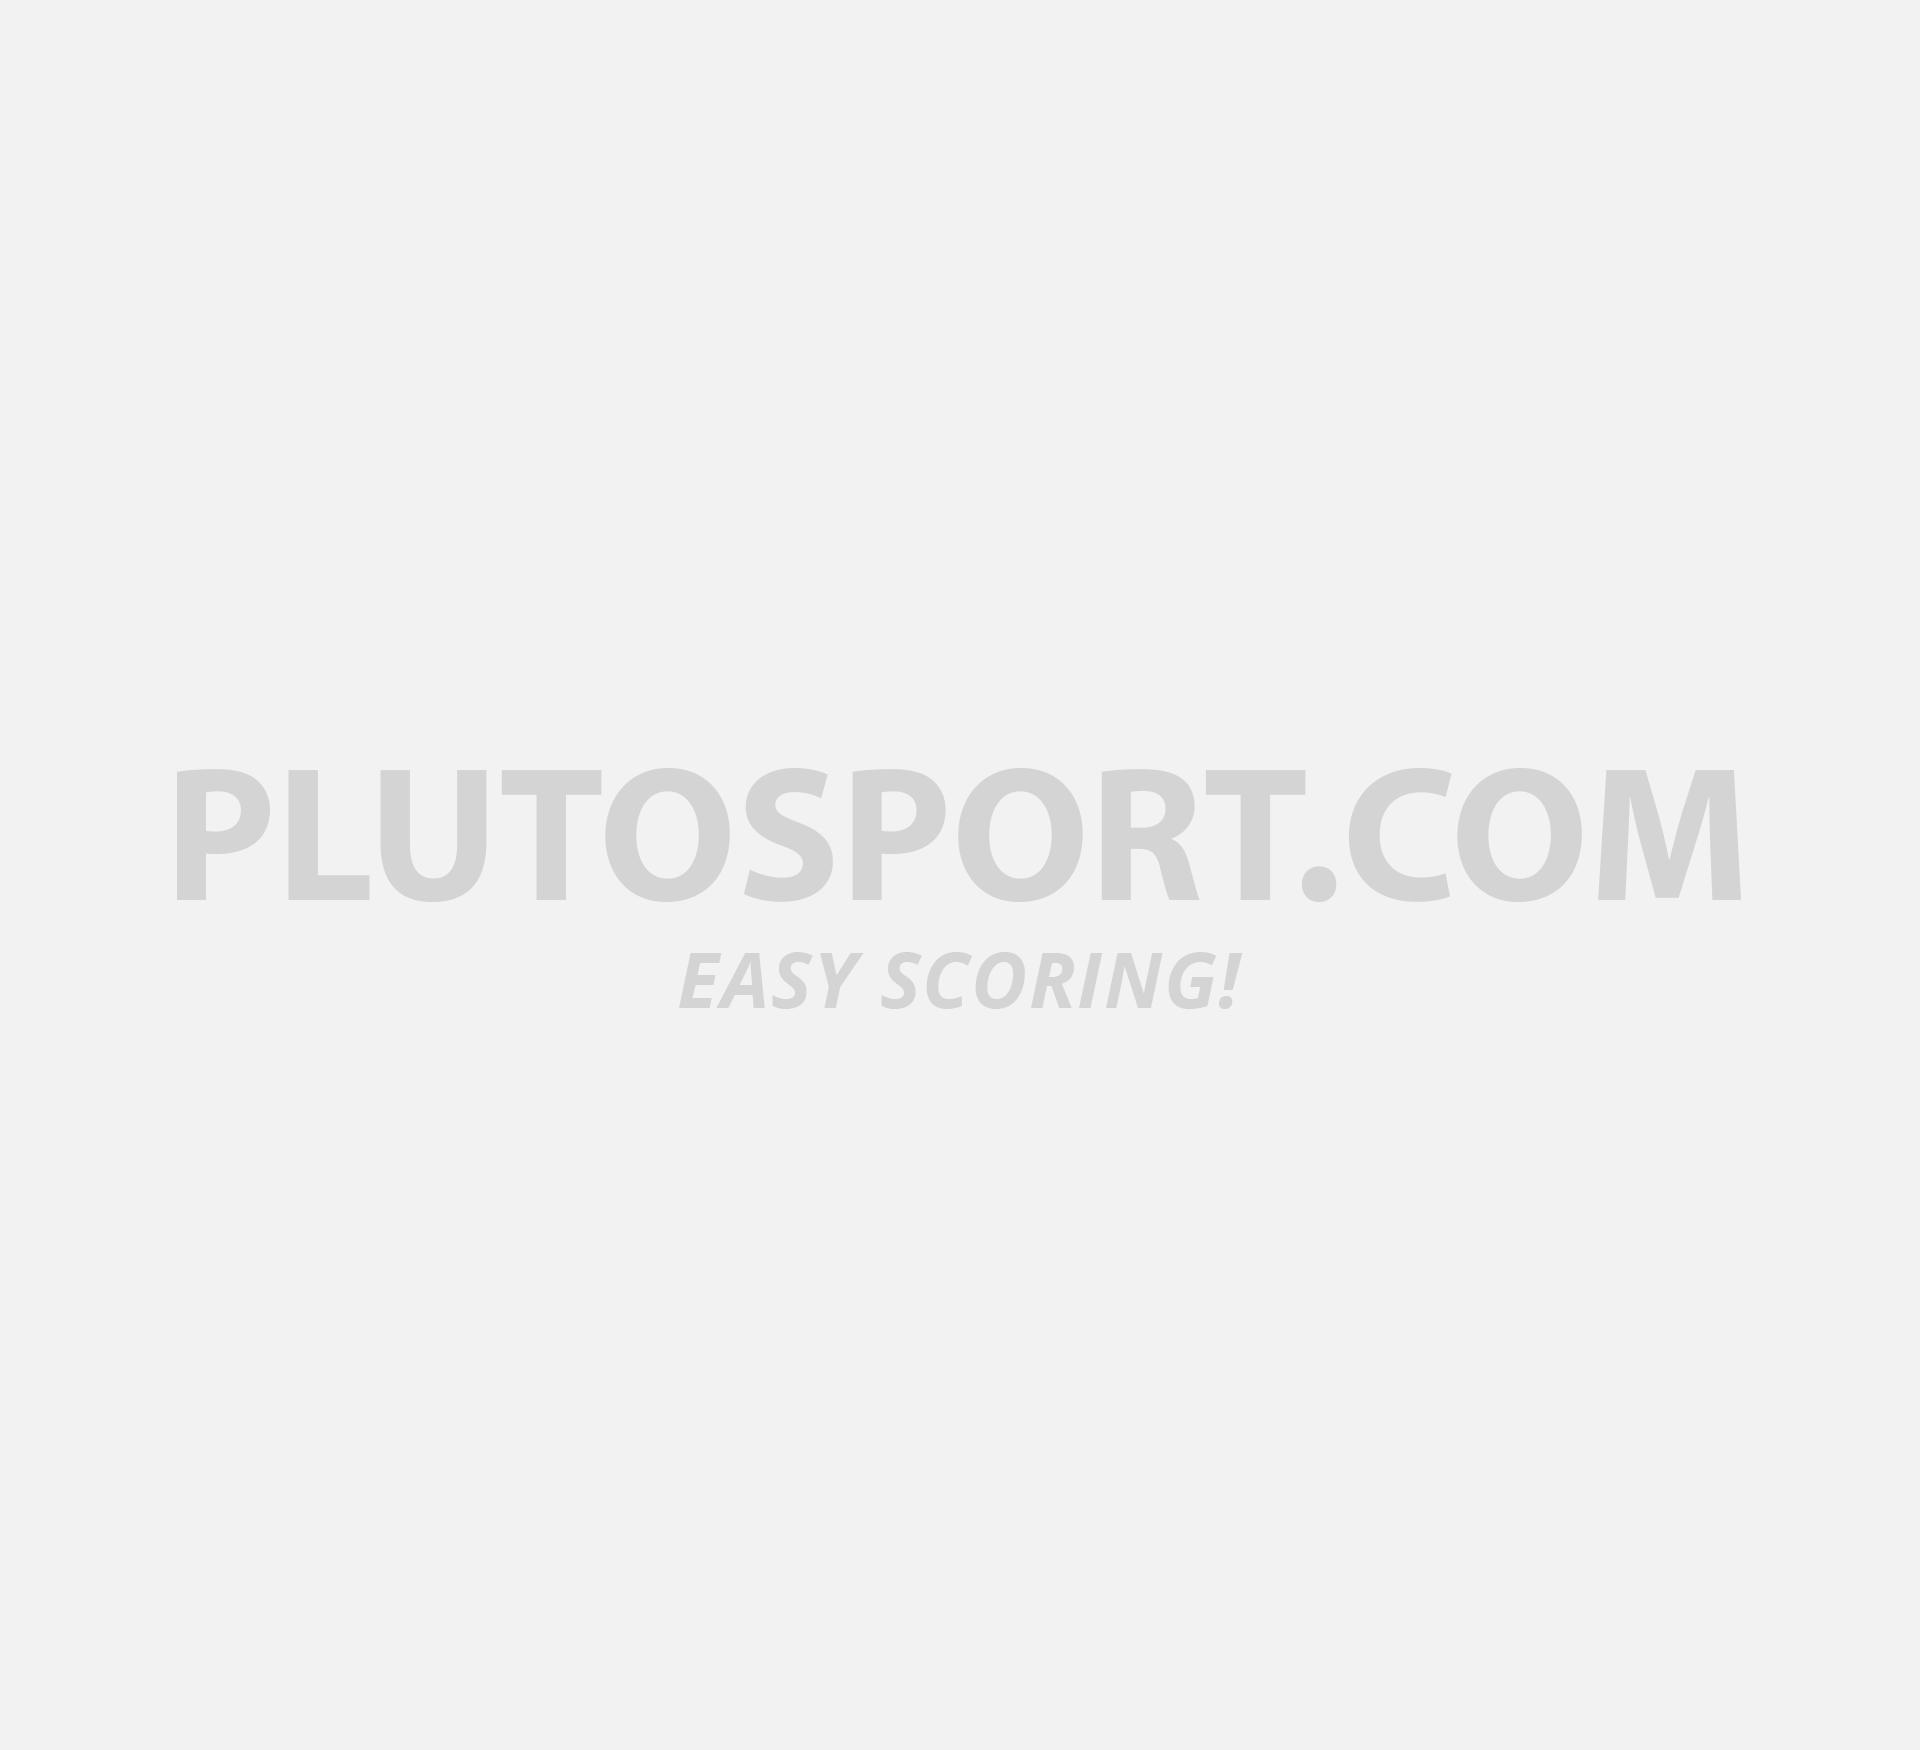 correr Almeja Por favor mira  Adidas X 15.2 FG/AG Leather - Boots fixed stud - Shoes - Football - Sports  | Plutosport